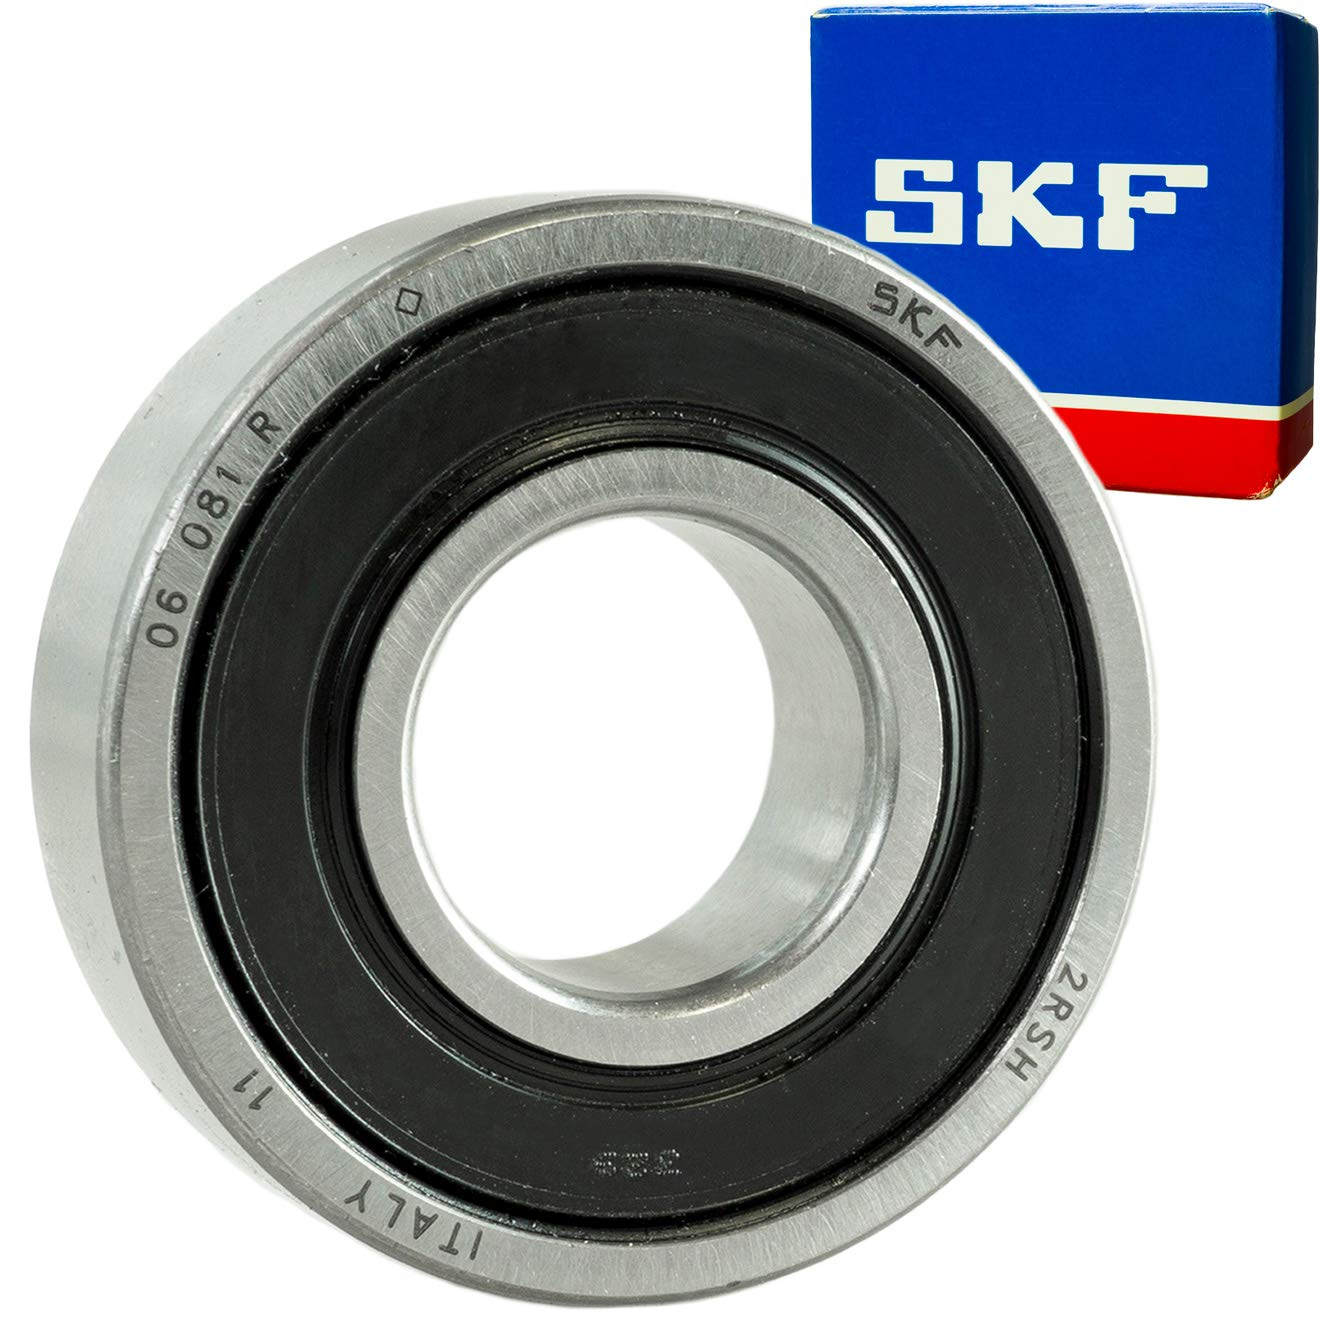 SKF 6205-2RS SEALED BEARING 25x52x15mm